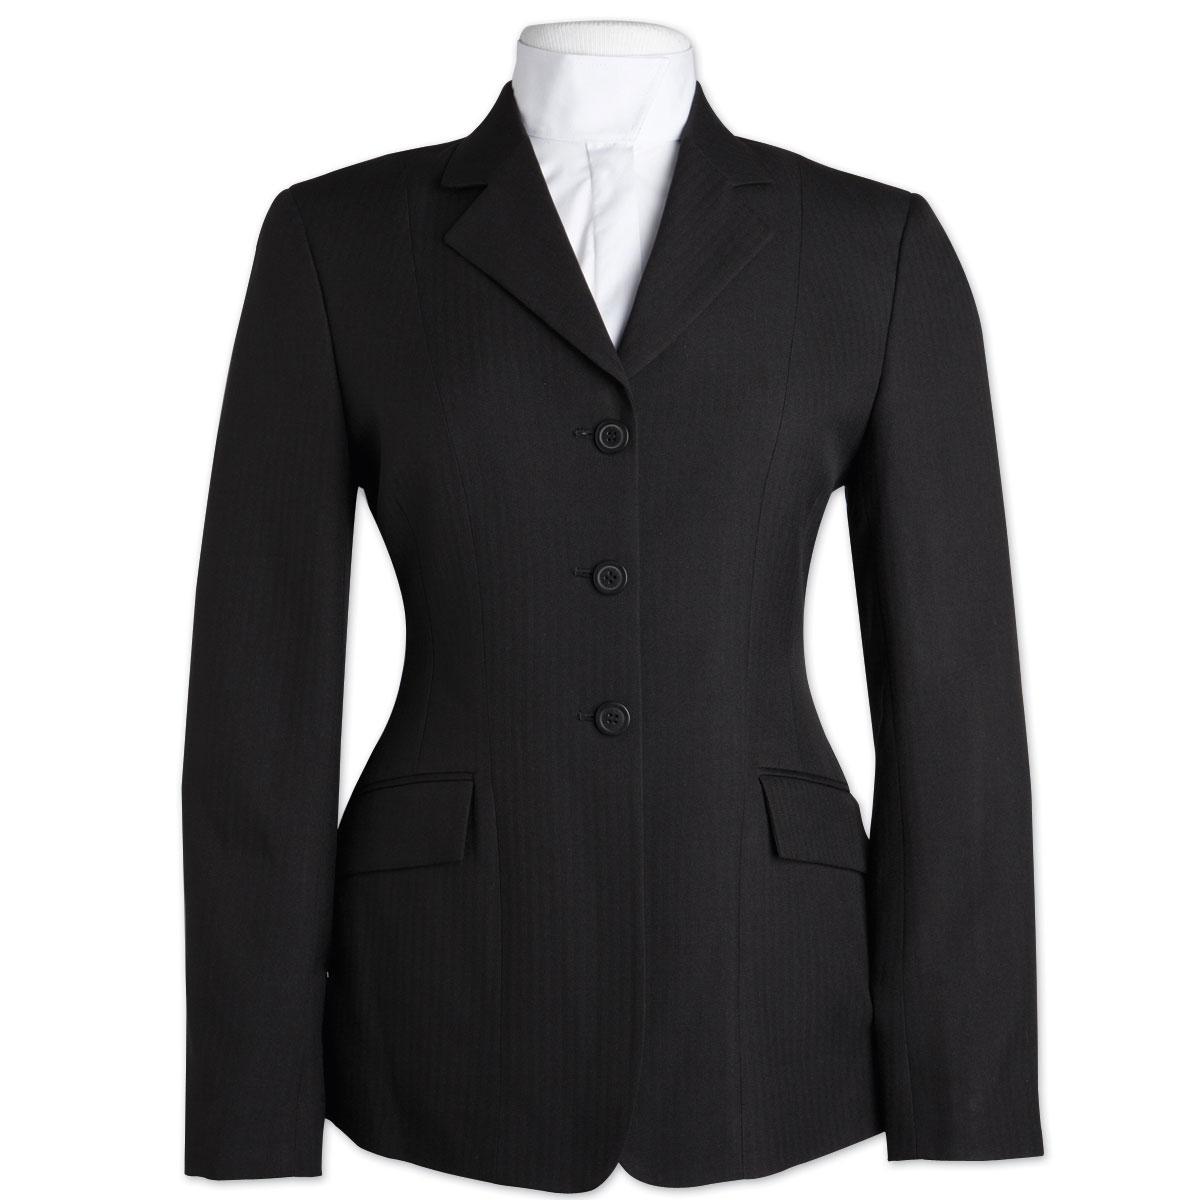 RJ Classics Devon Blue Label Show Coat